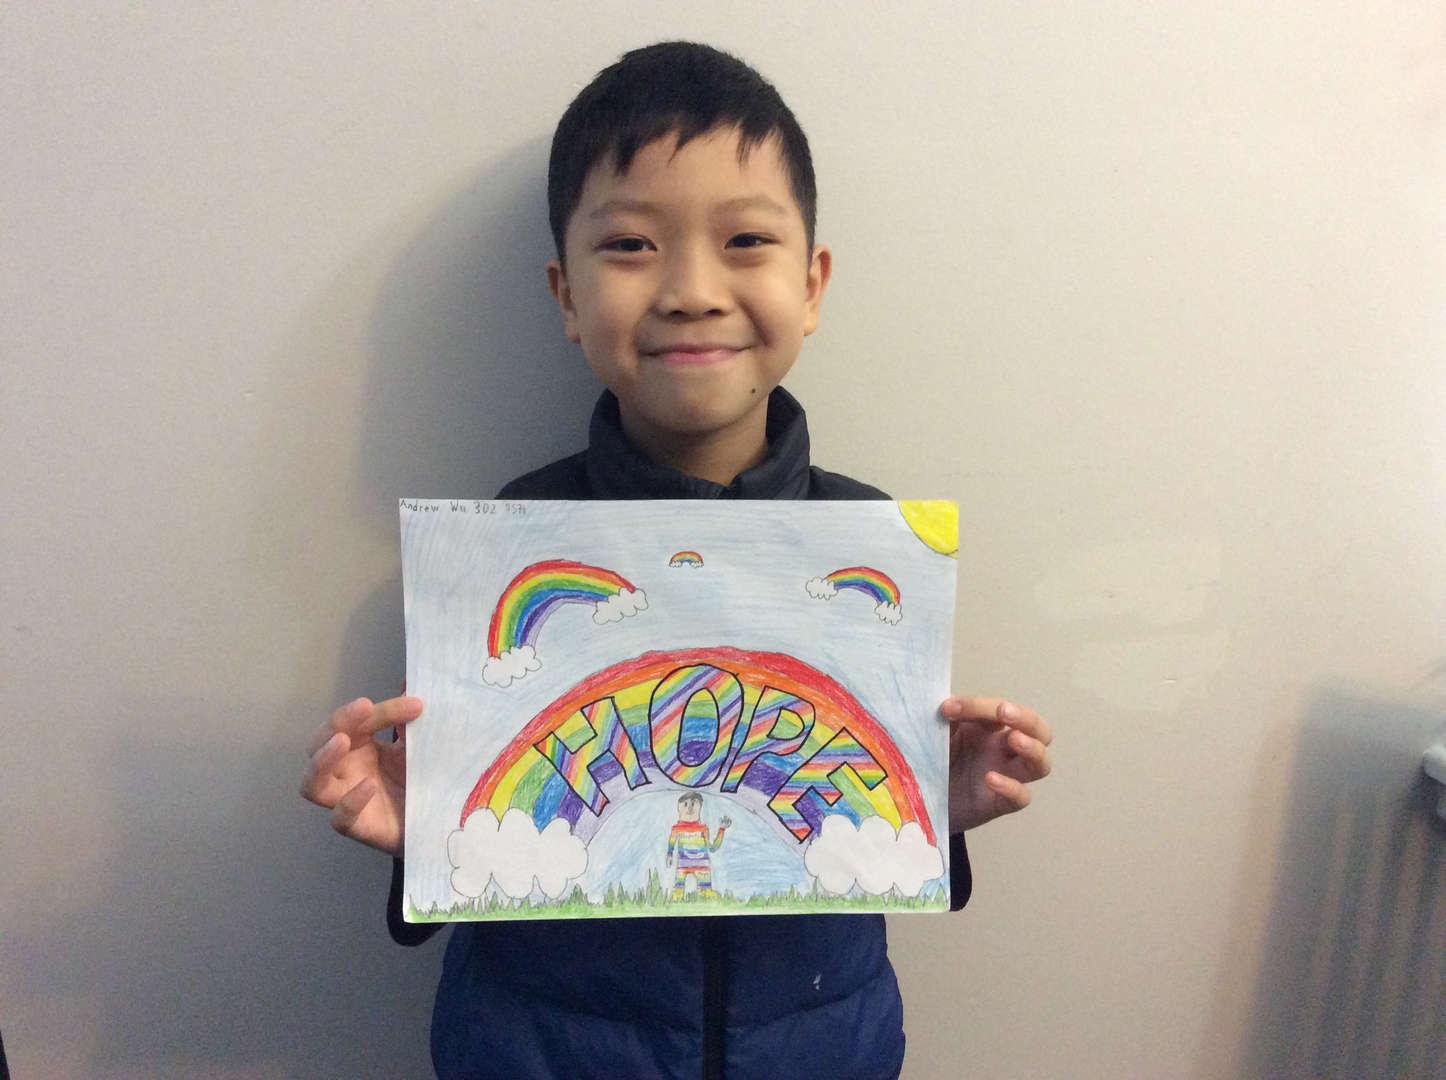 Andrew Wu 3rd grade